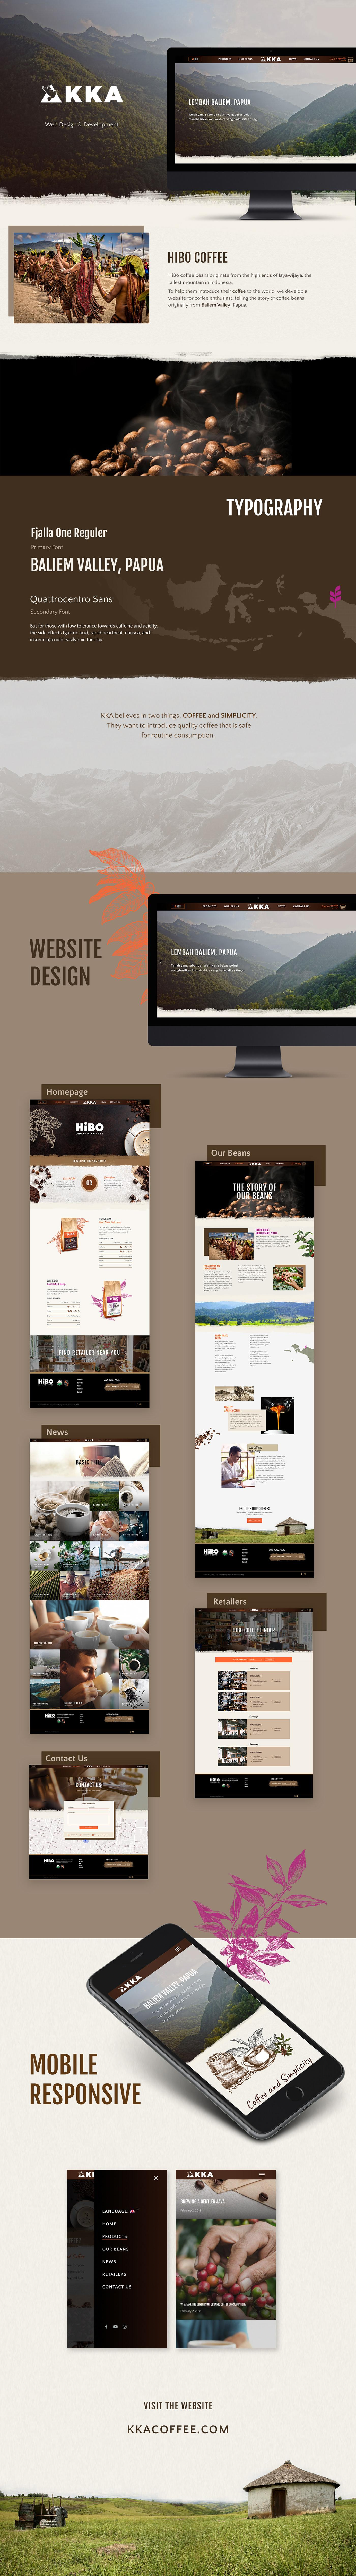 organic Coffee Website Web Design  indonesia web development  food and beverage Retail